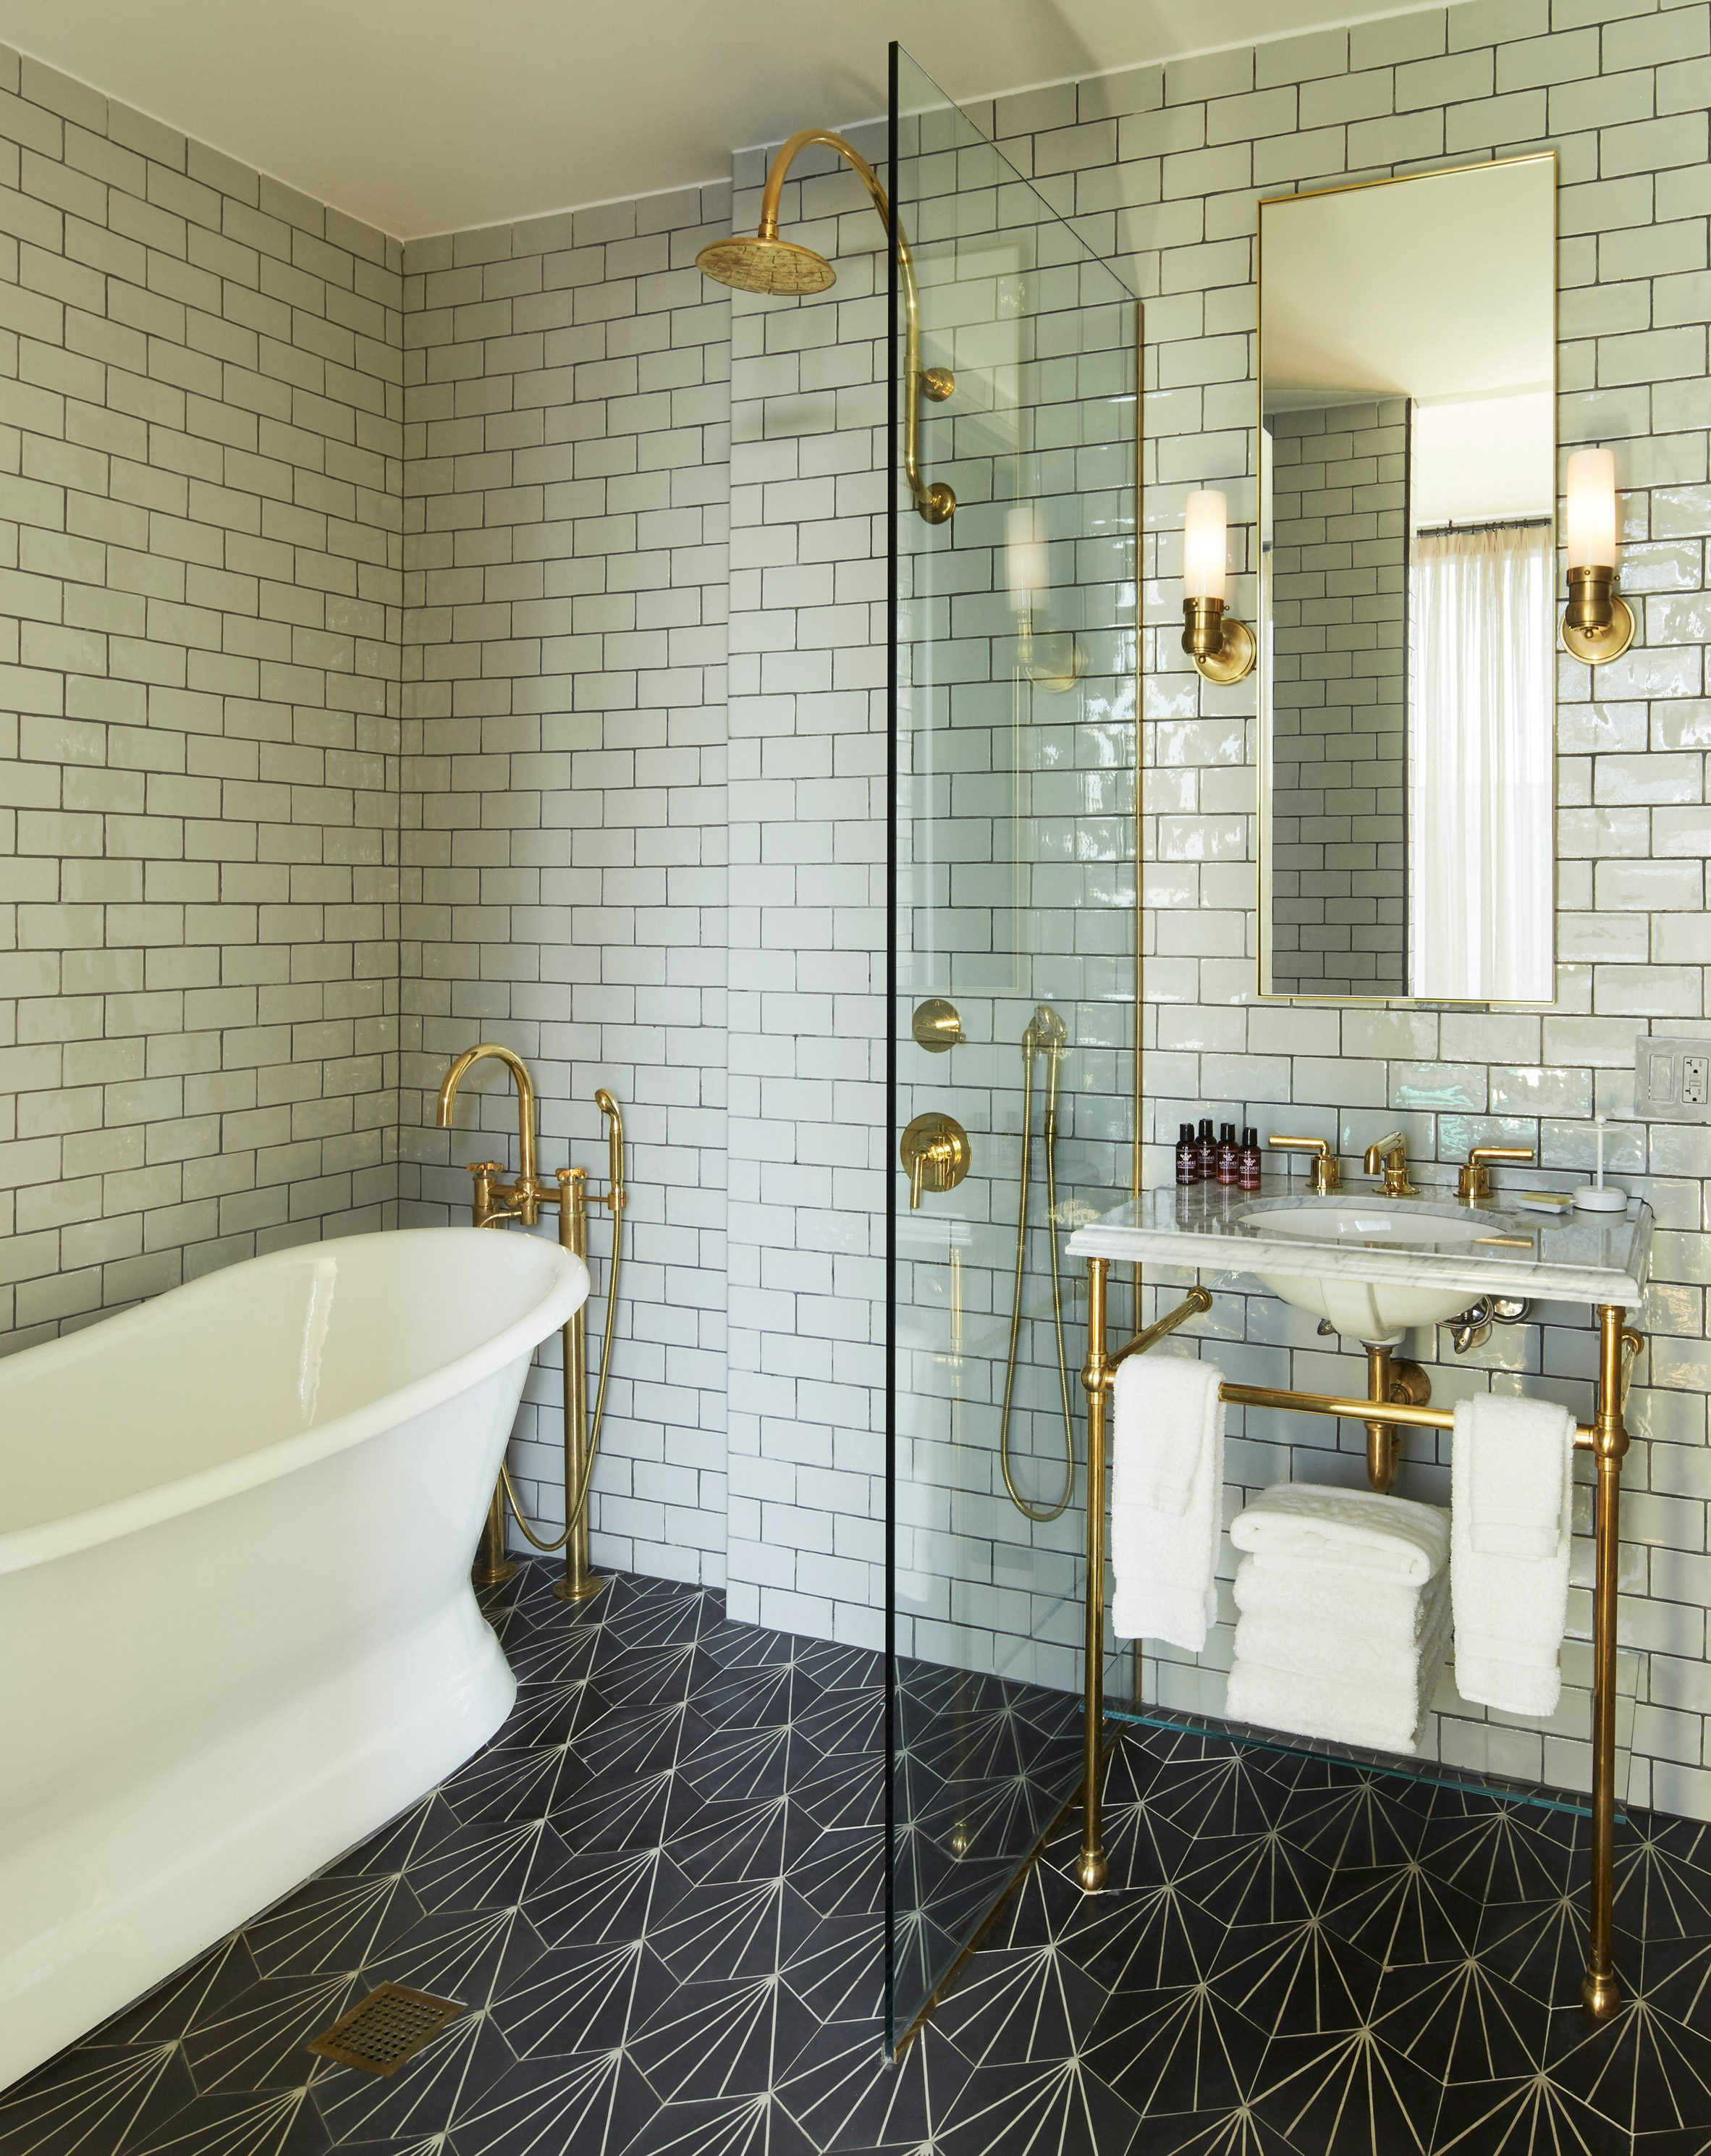 The Williamsburg Hotel by Michaelis Boyd Associates